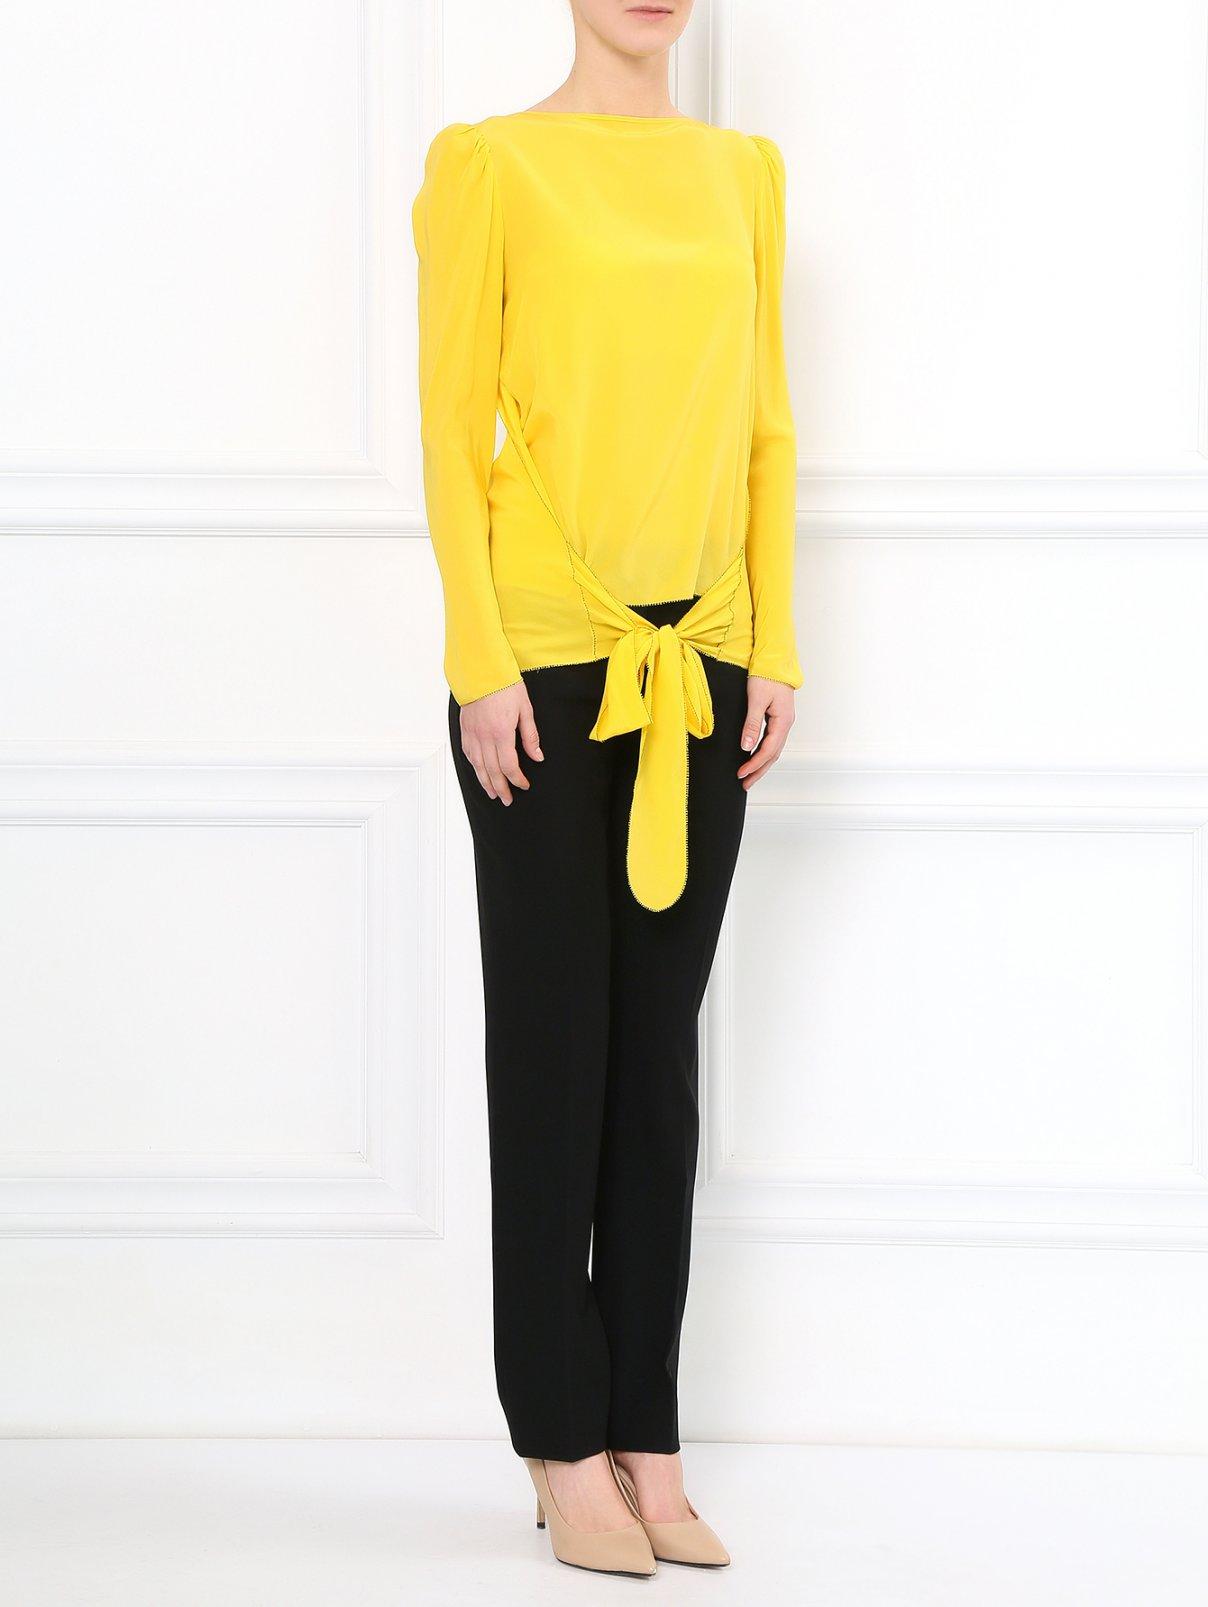 Блуза из шелка с объемнми рукавами See by Chloé  –  Модель Общий вид  – Цвет:  Желтый